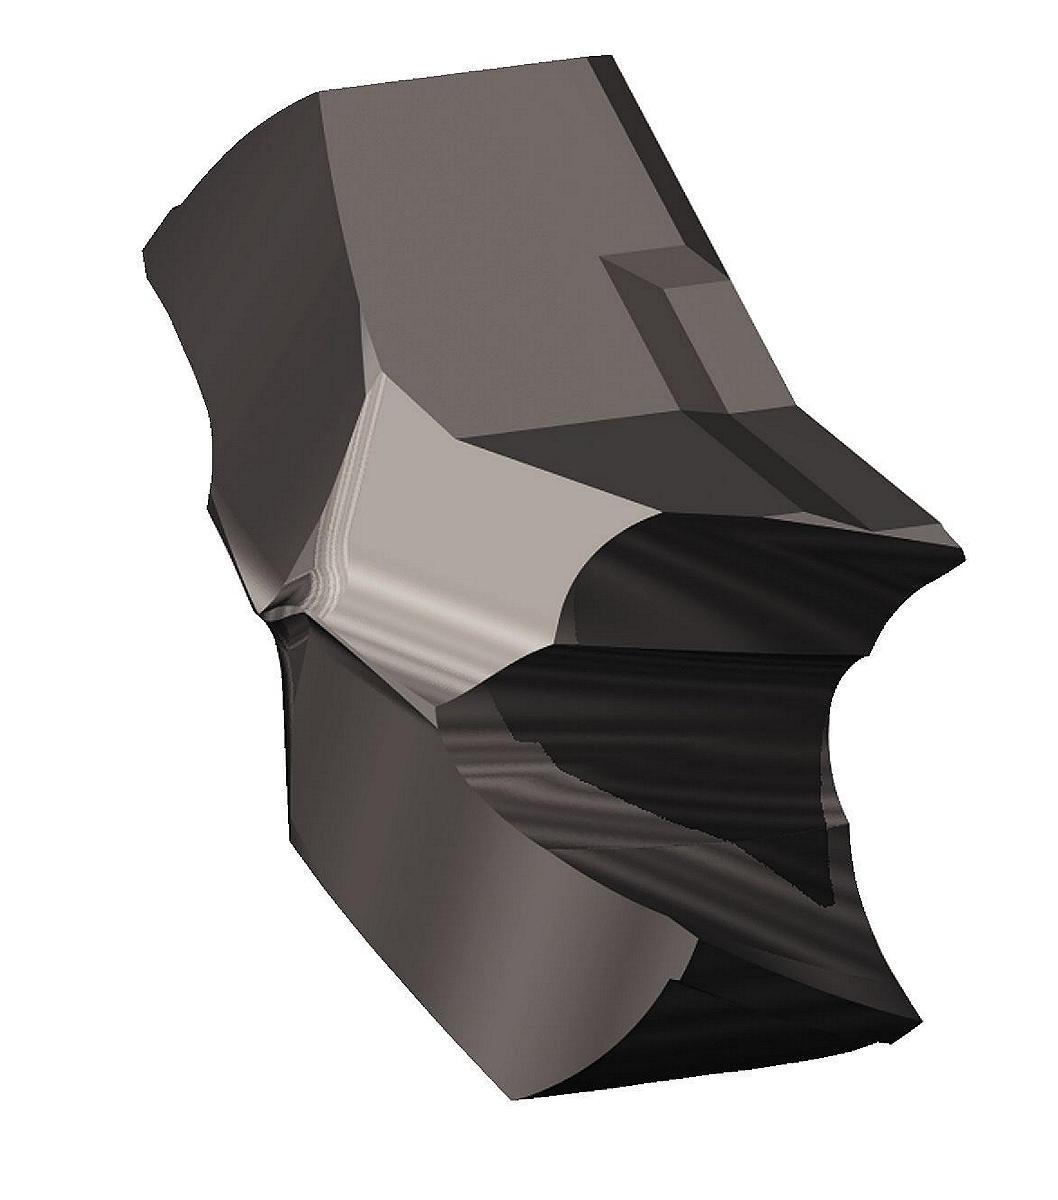 Plaquitas de metal duro KSEM™